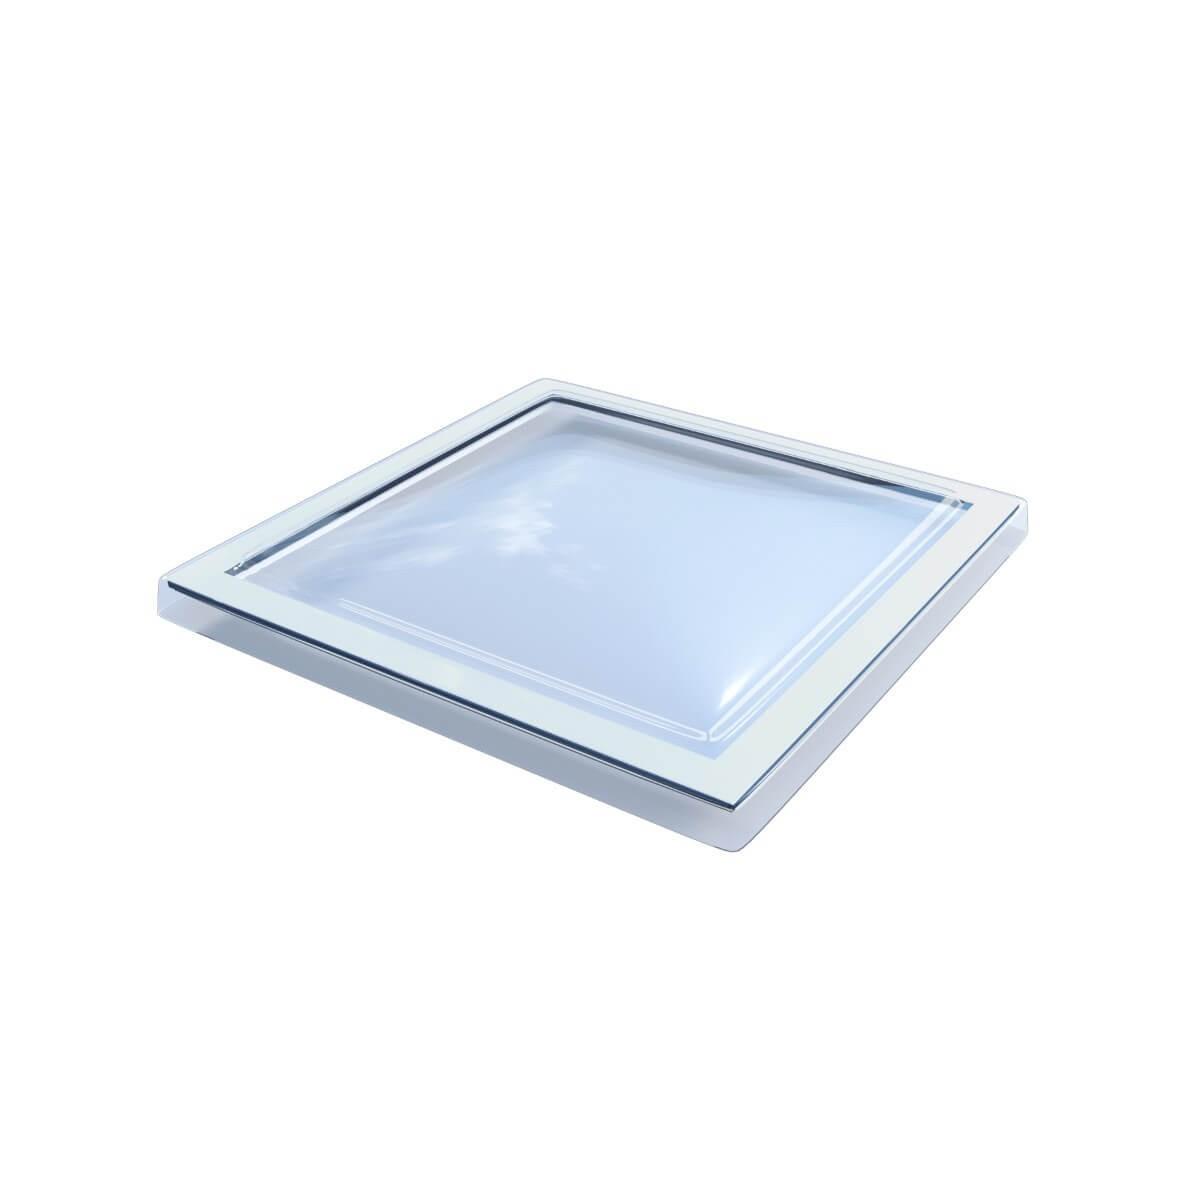 Mardome Reflex Pvc Flat Roof Window Opal